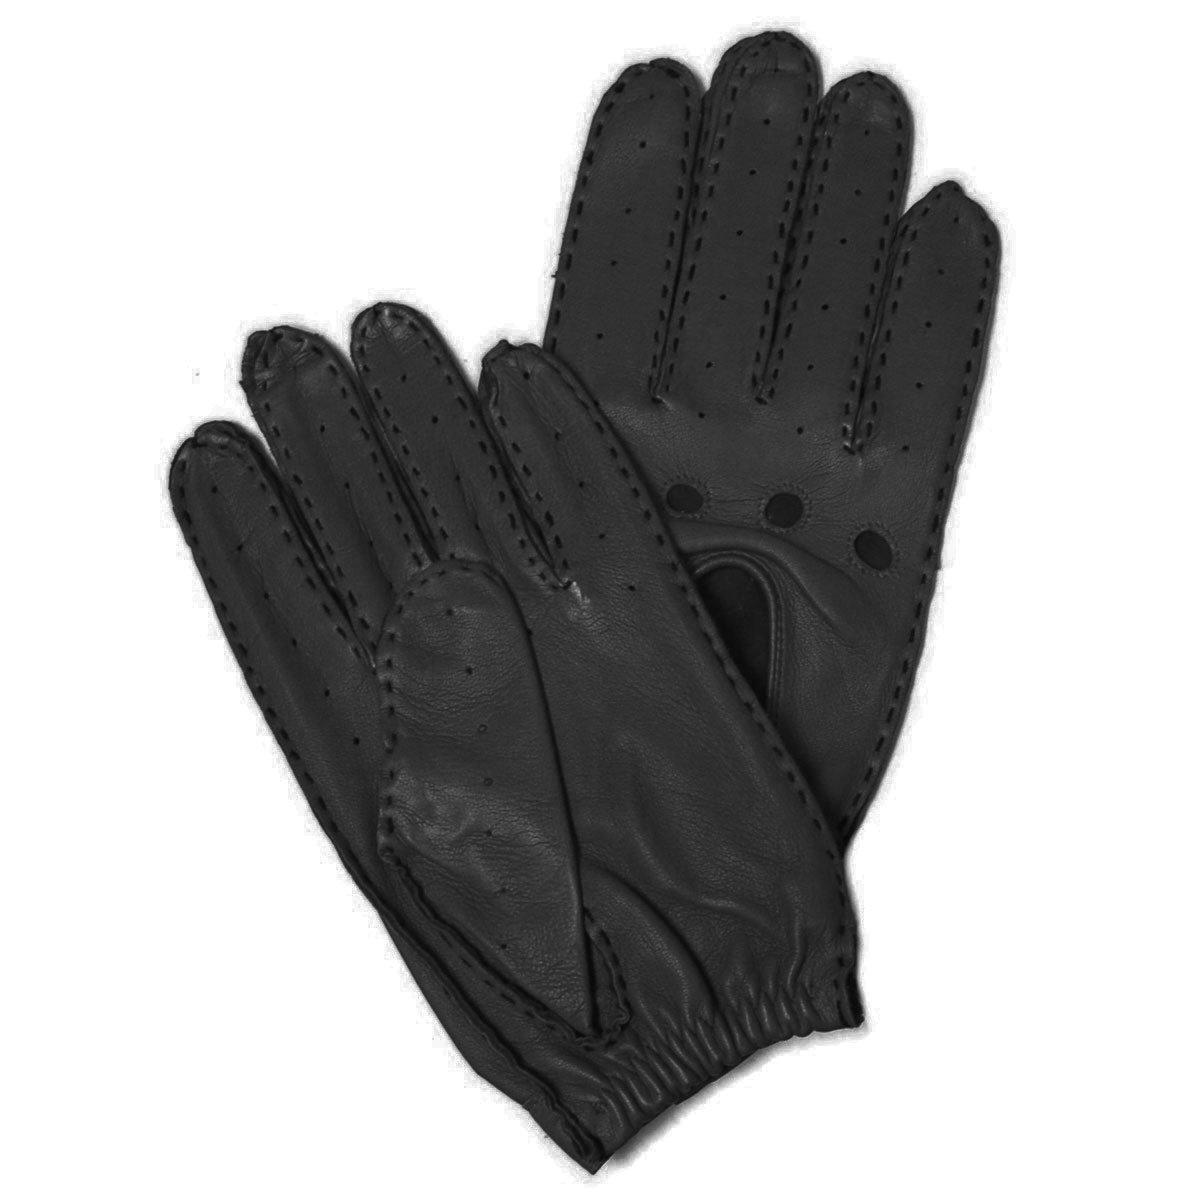 Hilts-Willard Men's Leather Driving Gloves - XL - Black